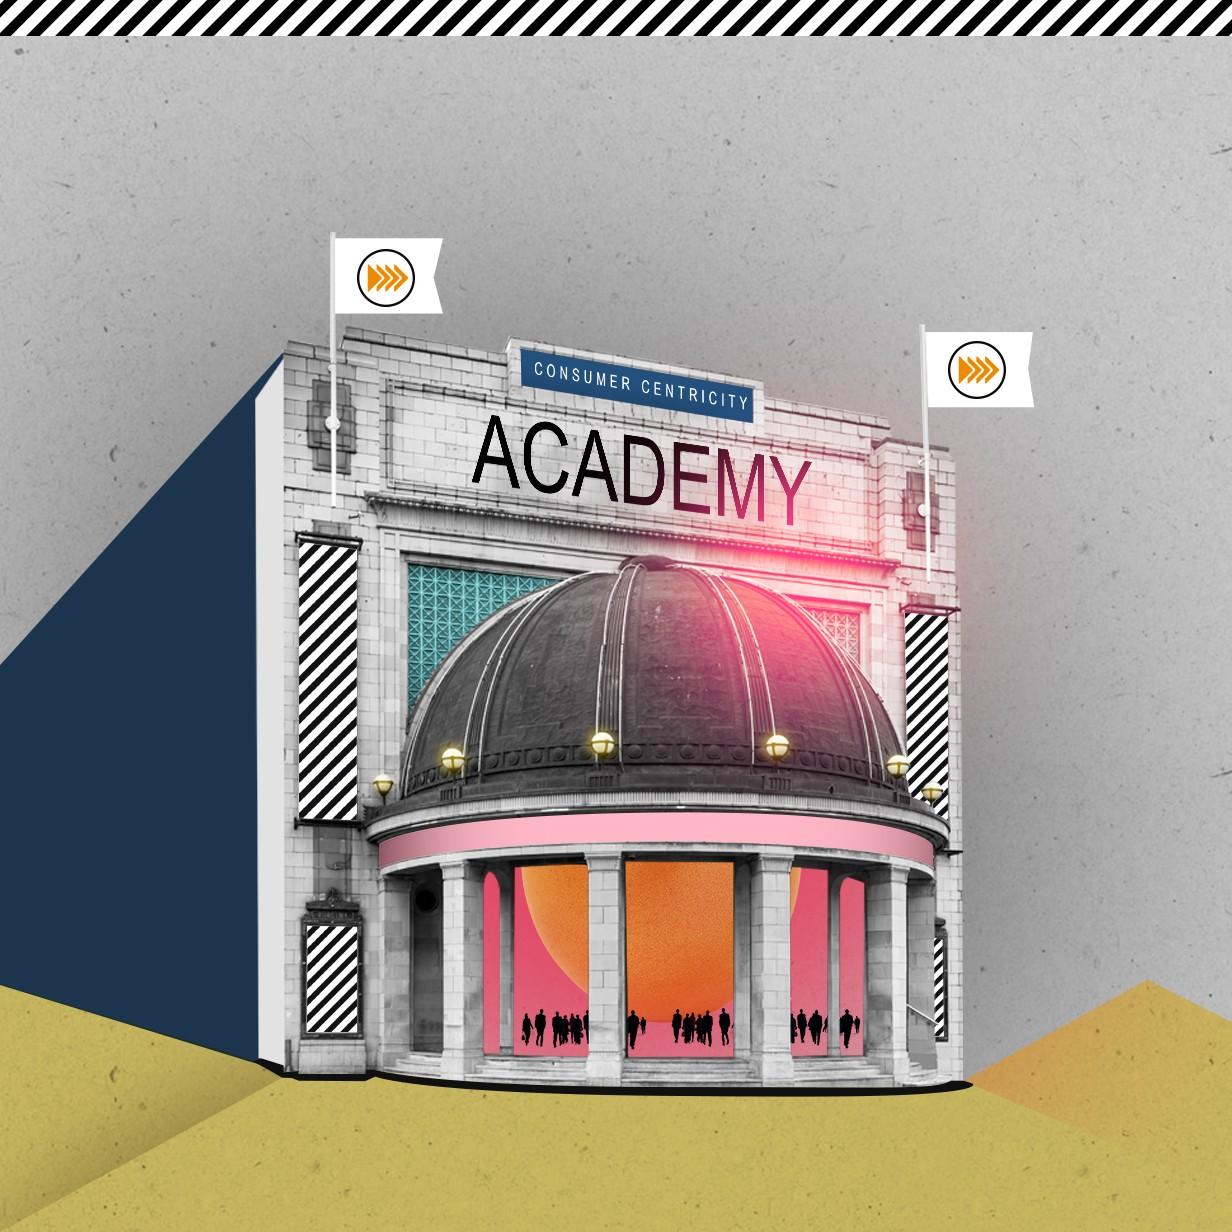 Consumer Centricity Academy